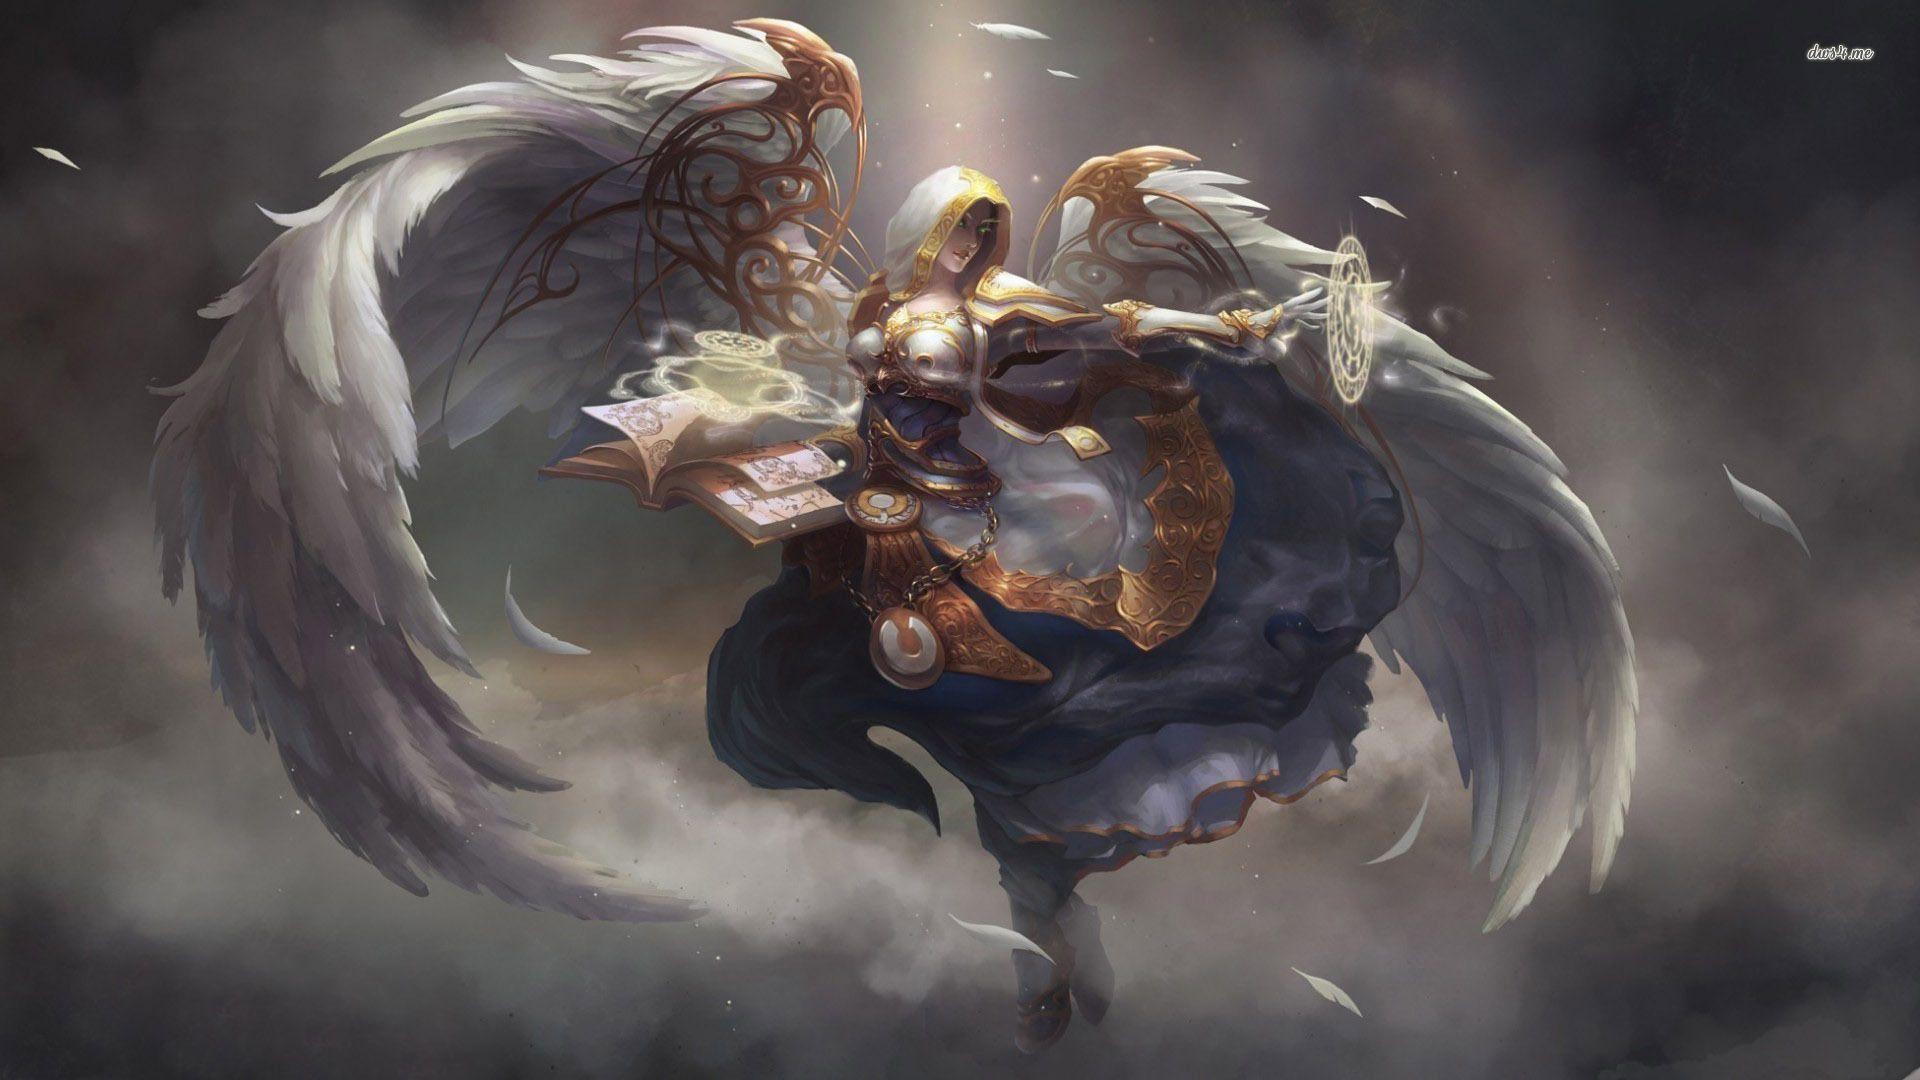 Best 25 World of warcraft wallpaper ideas on Pinterest Warcraft